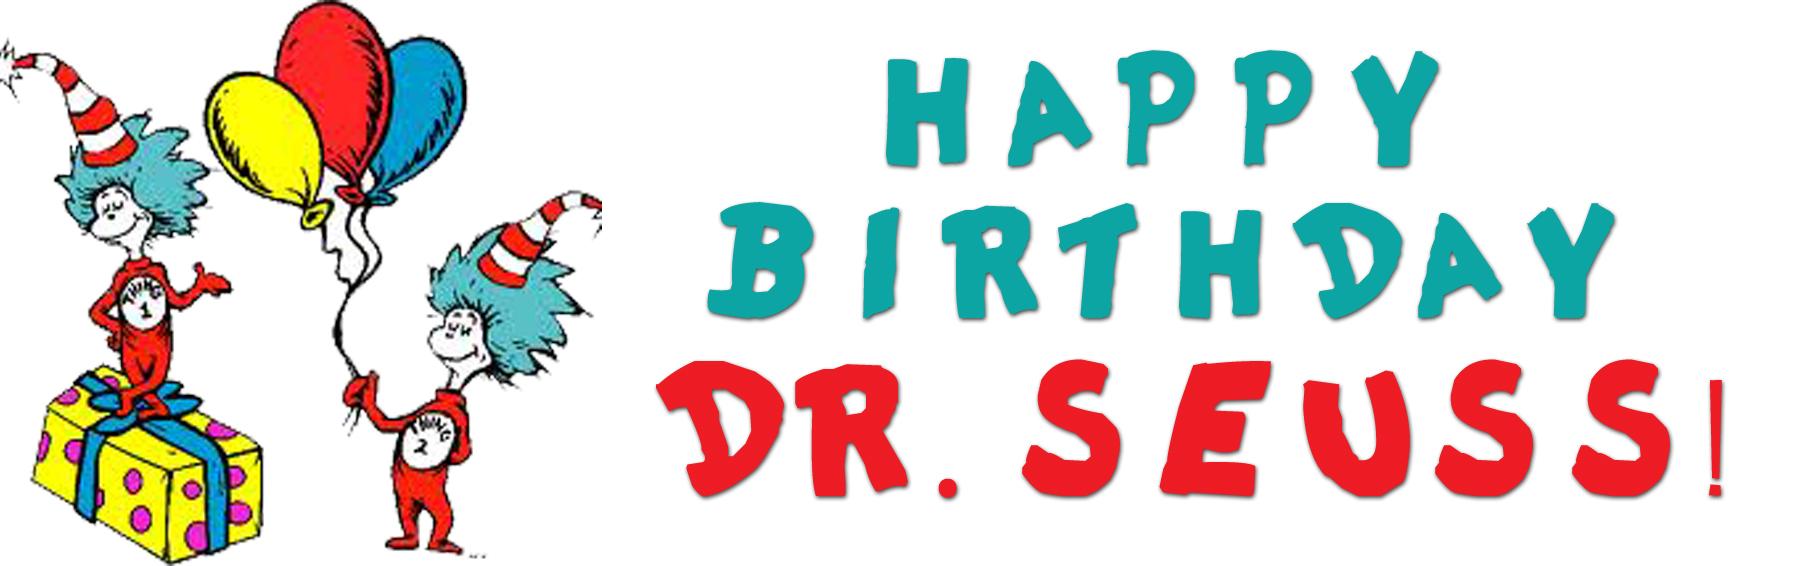 Happy Birthday Dr Seuss Clip Art